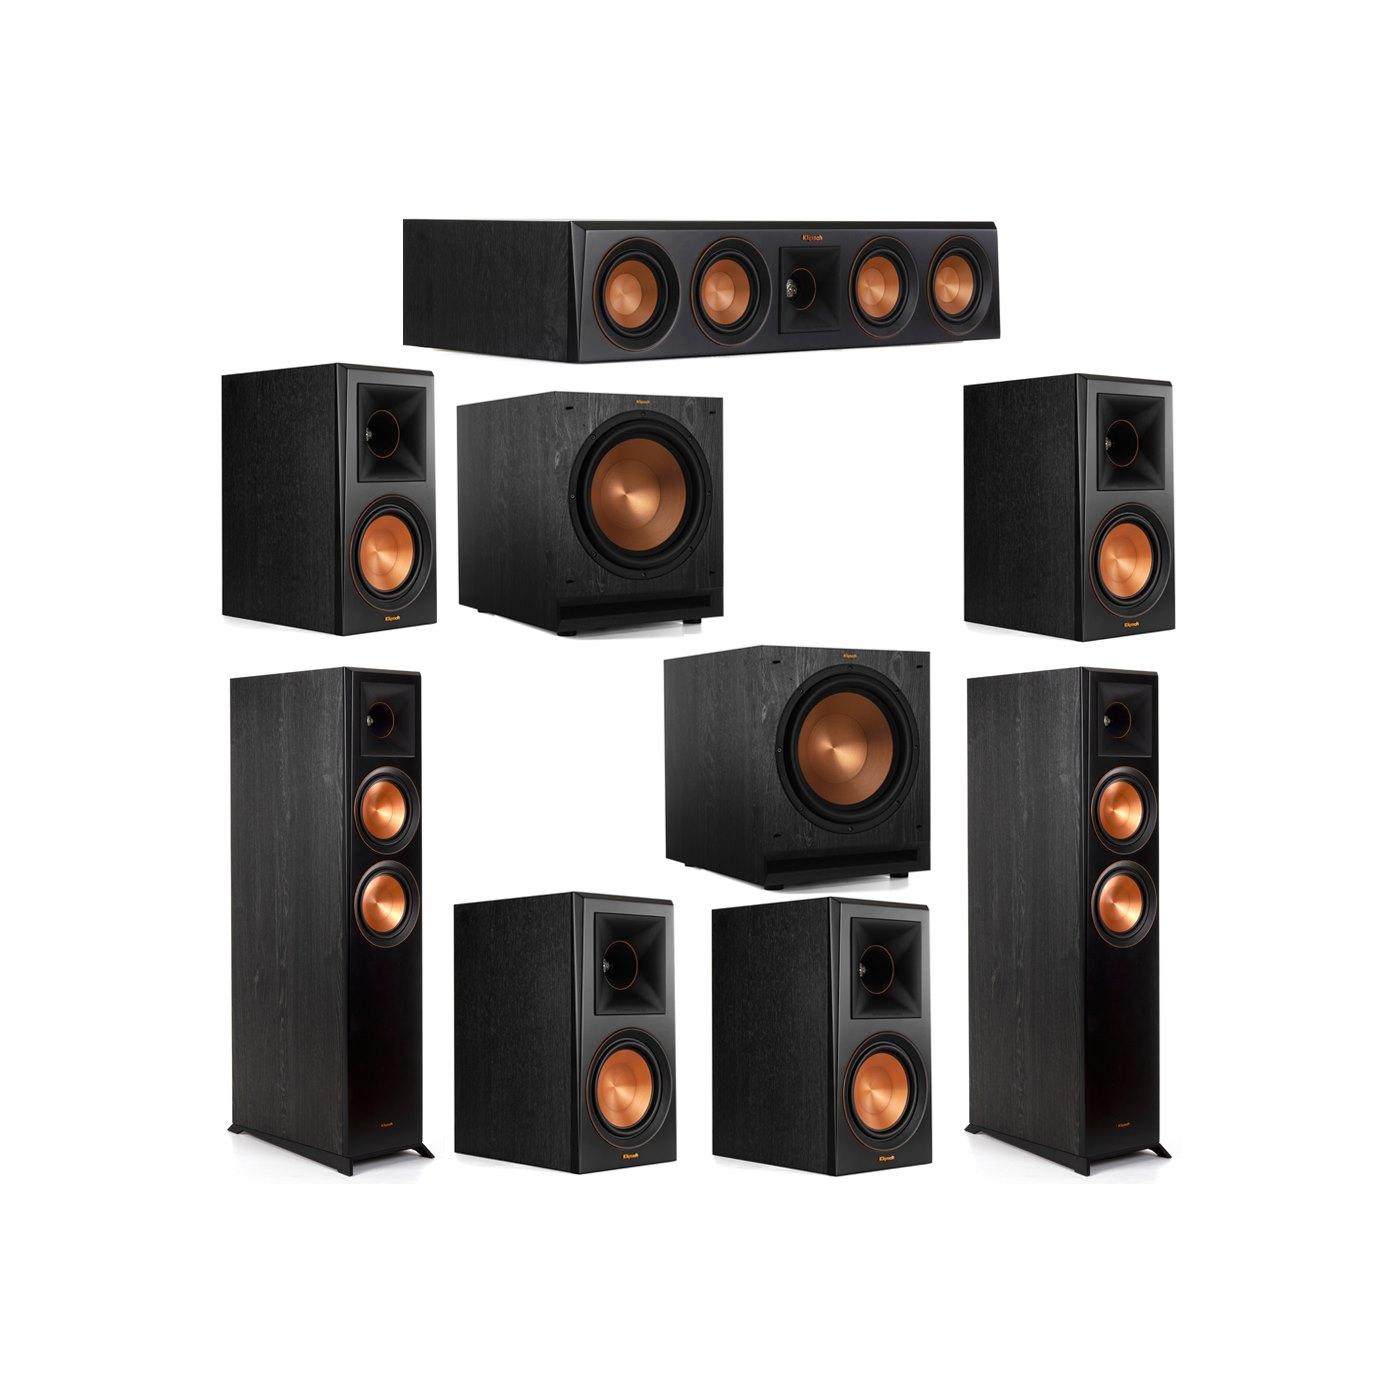 Klipsch 7.2 System with 2 RP-6000F Floorstanding Speakers, 1 Klipsch RP-404C Center Speaker, 4 Klipsch RP-600M Surround Speakers, 2 Klipsch SPL-120 Subwoofers